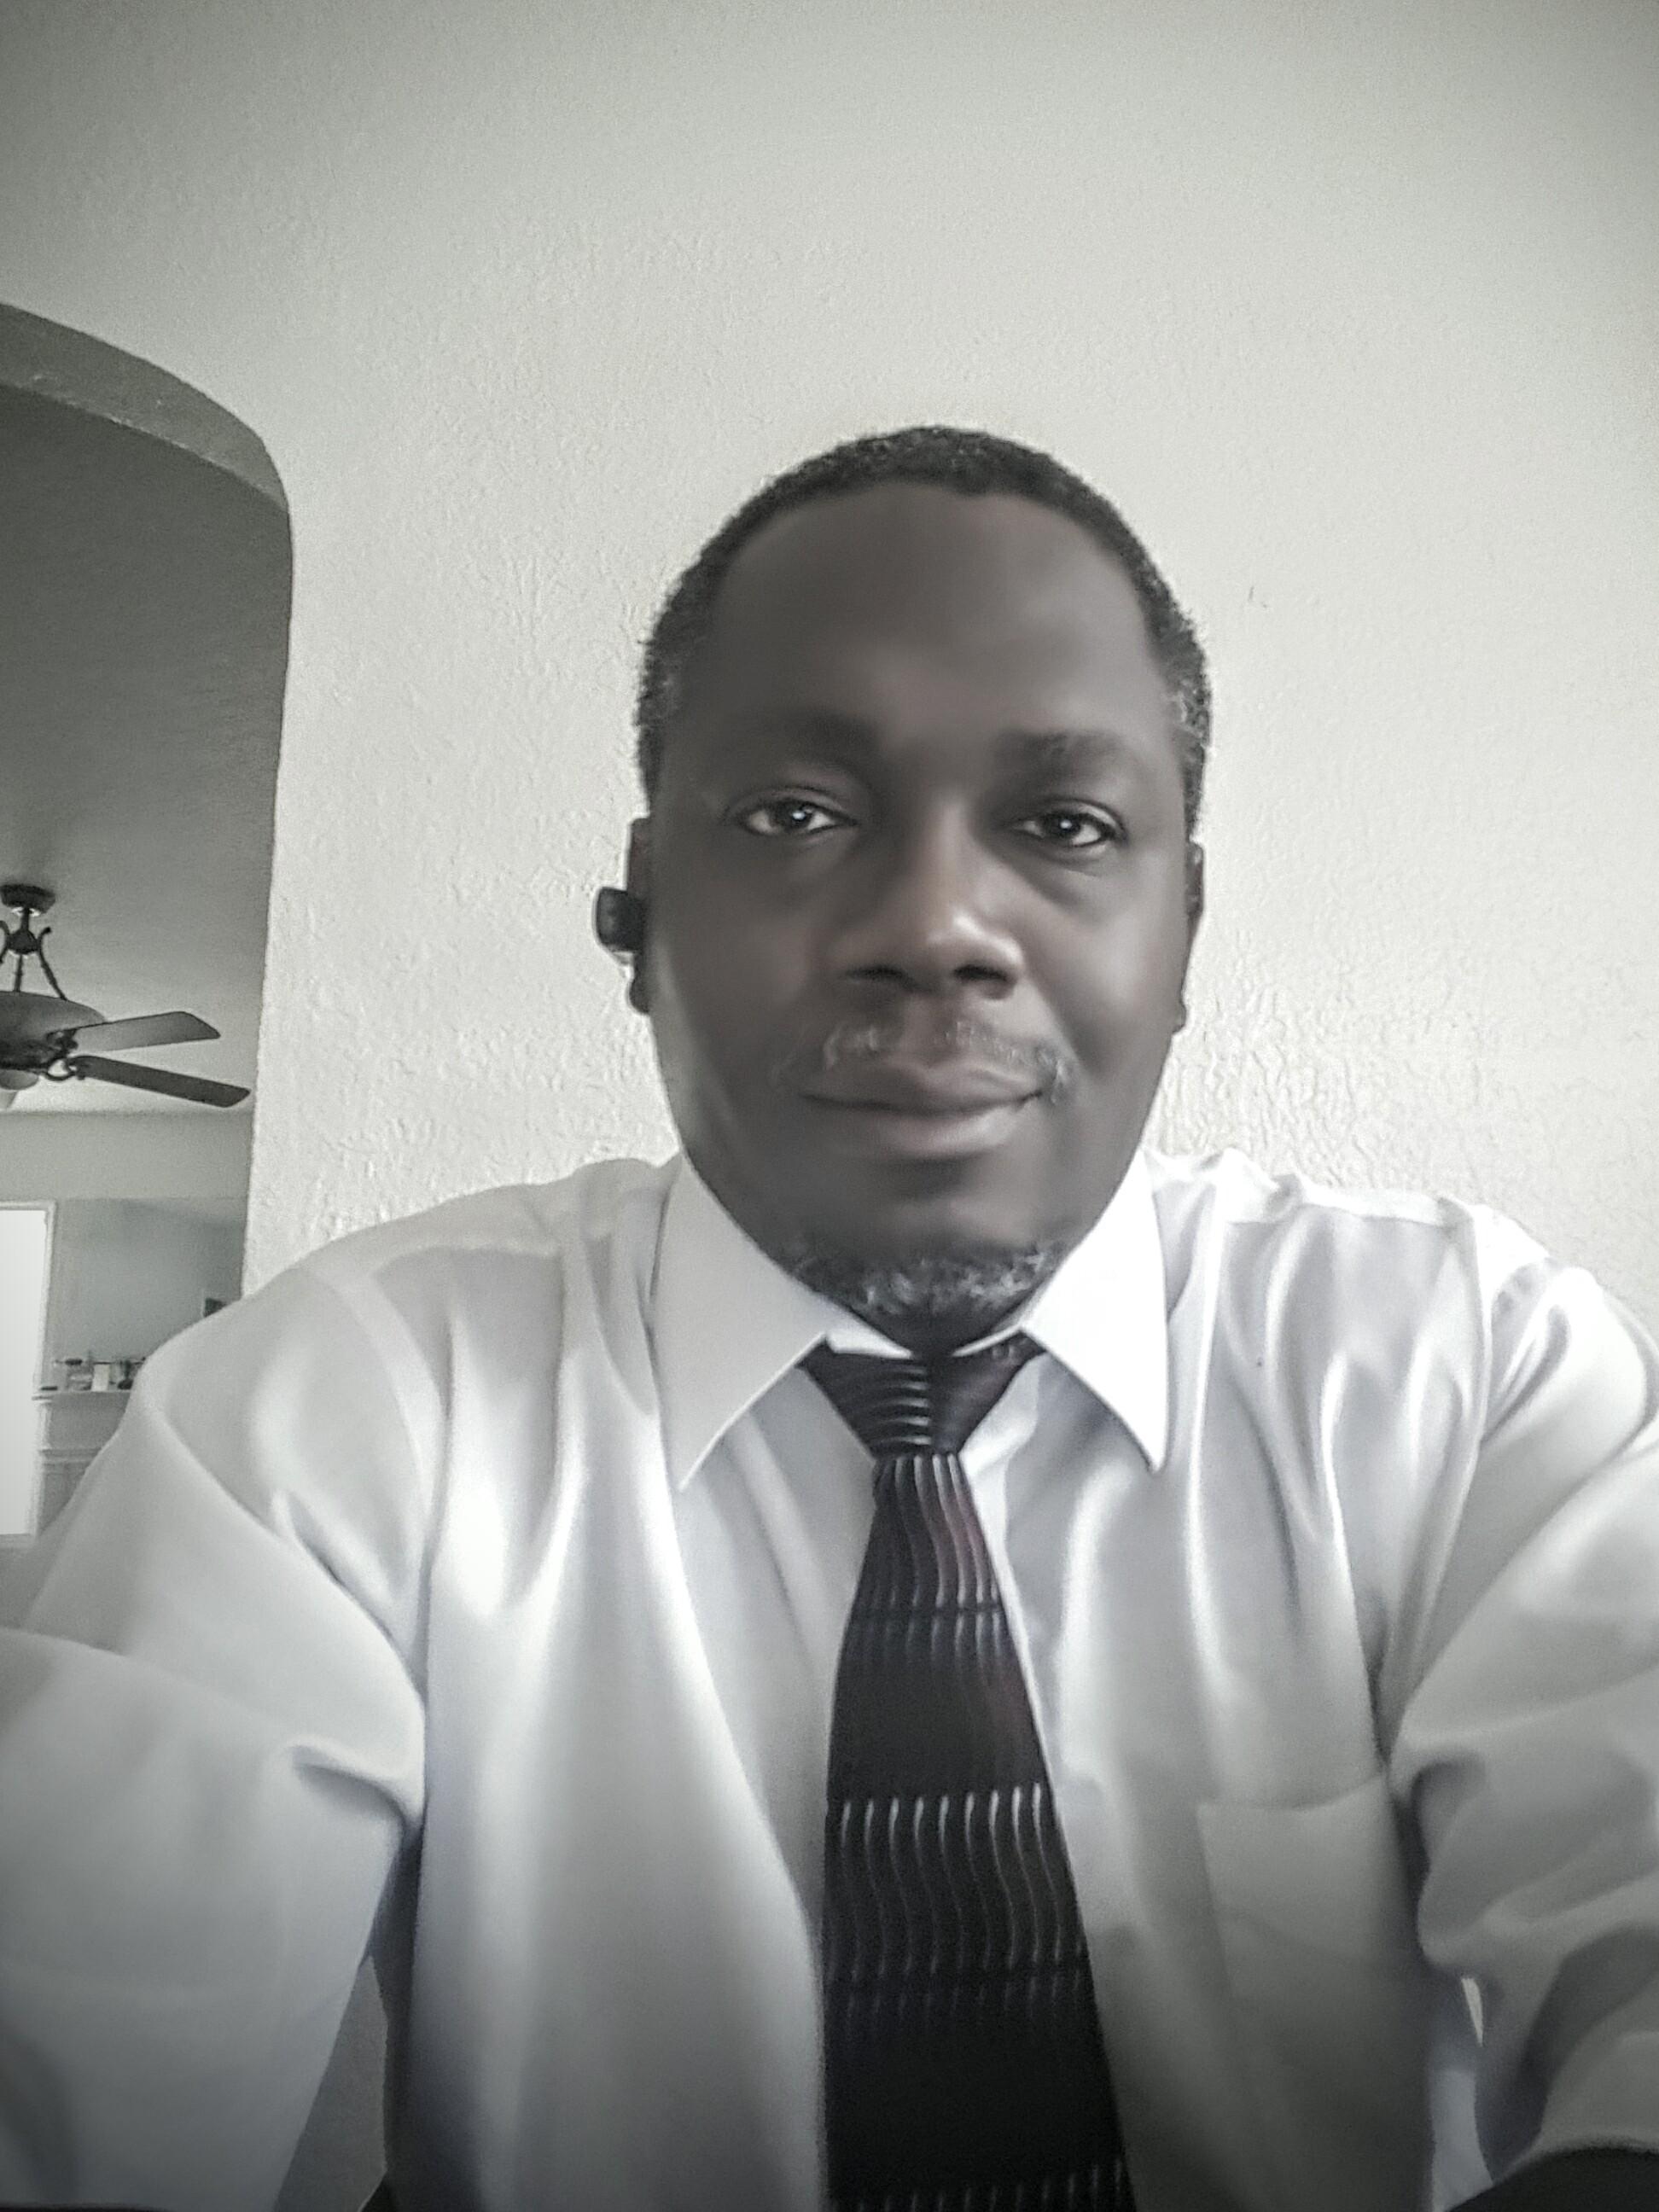 Baba Croom, a Saint Leo University student